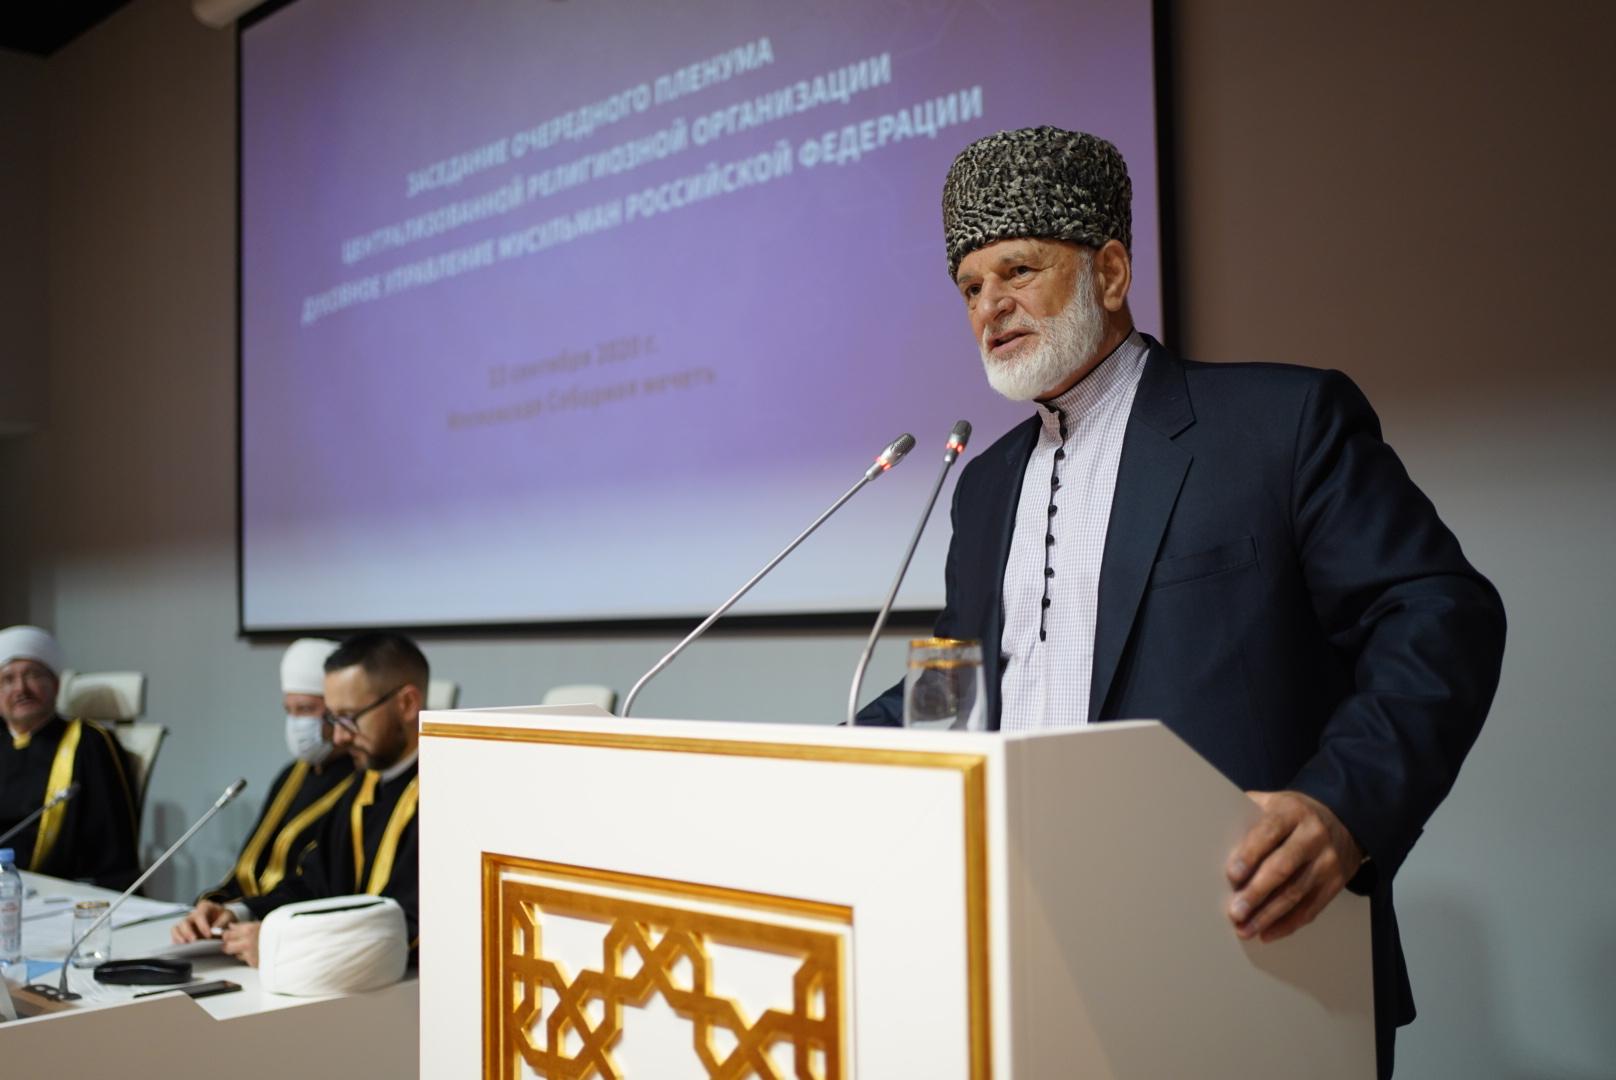 ДУМ РФ ответило на претензии кавказских муфтиев из КЦМСК